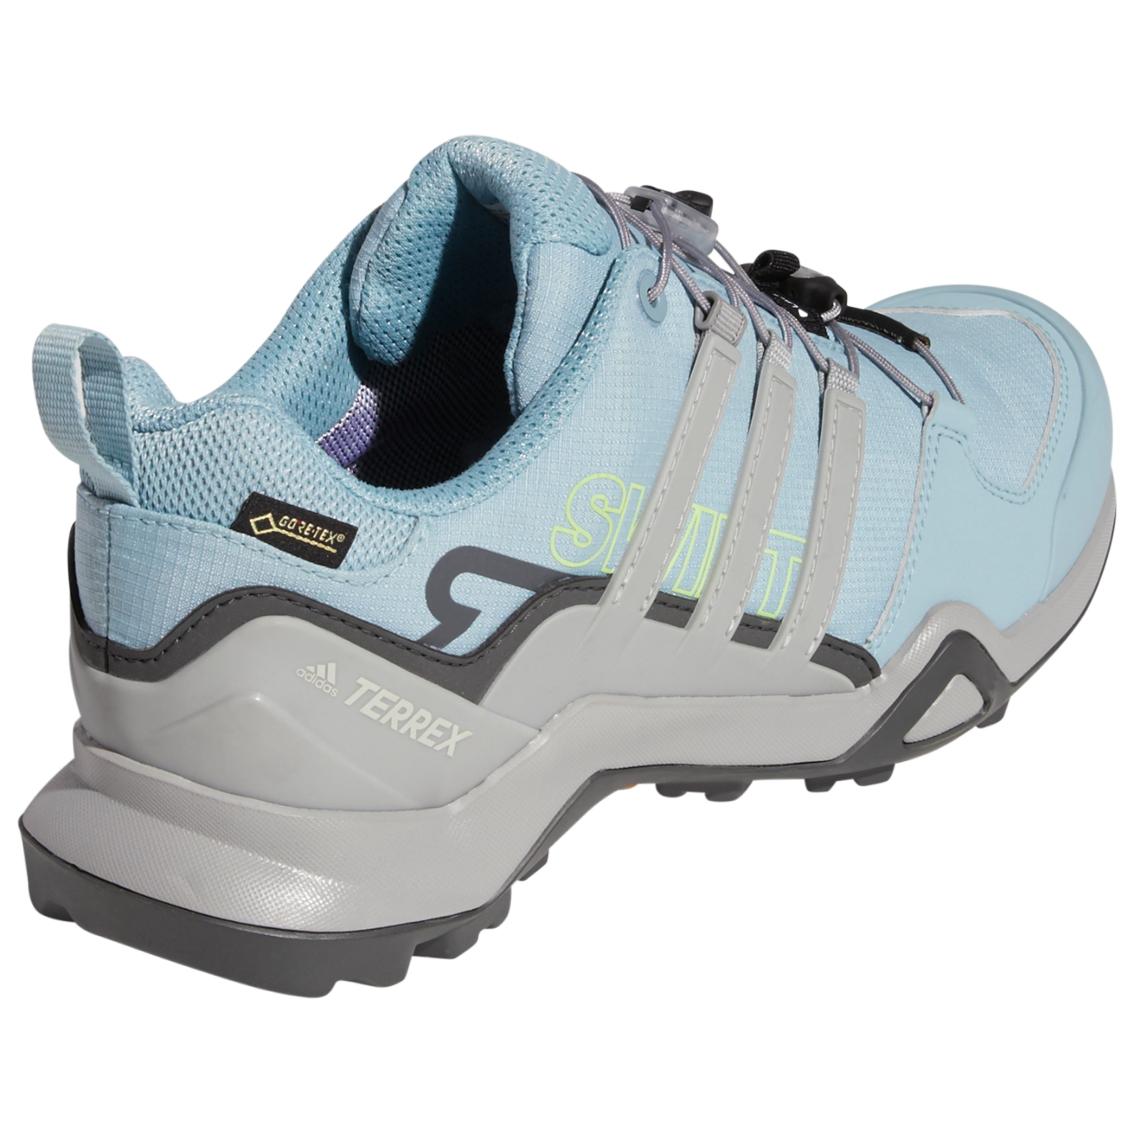 3ff38cc1c ... adidas - Women s Terrex Swift R2 GTX - Multisport shoes ...